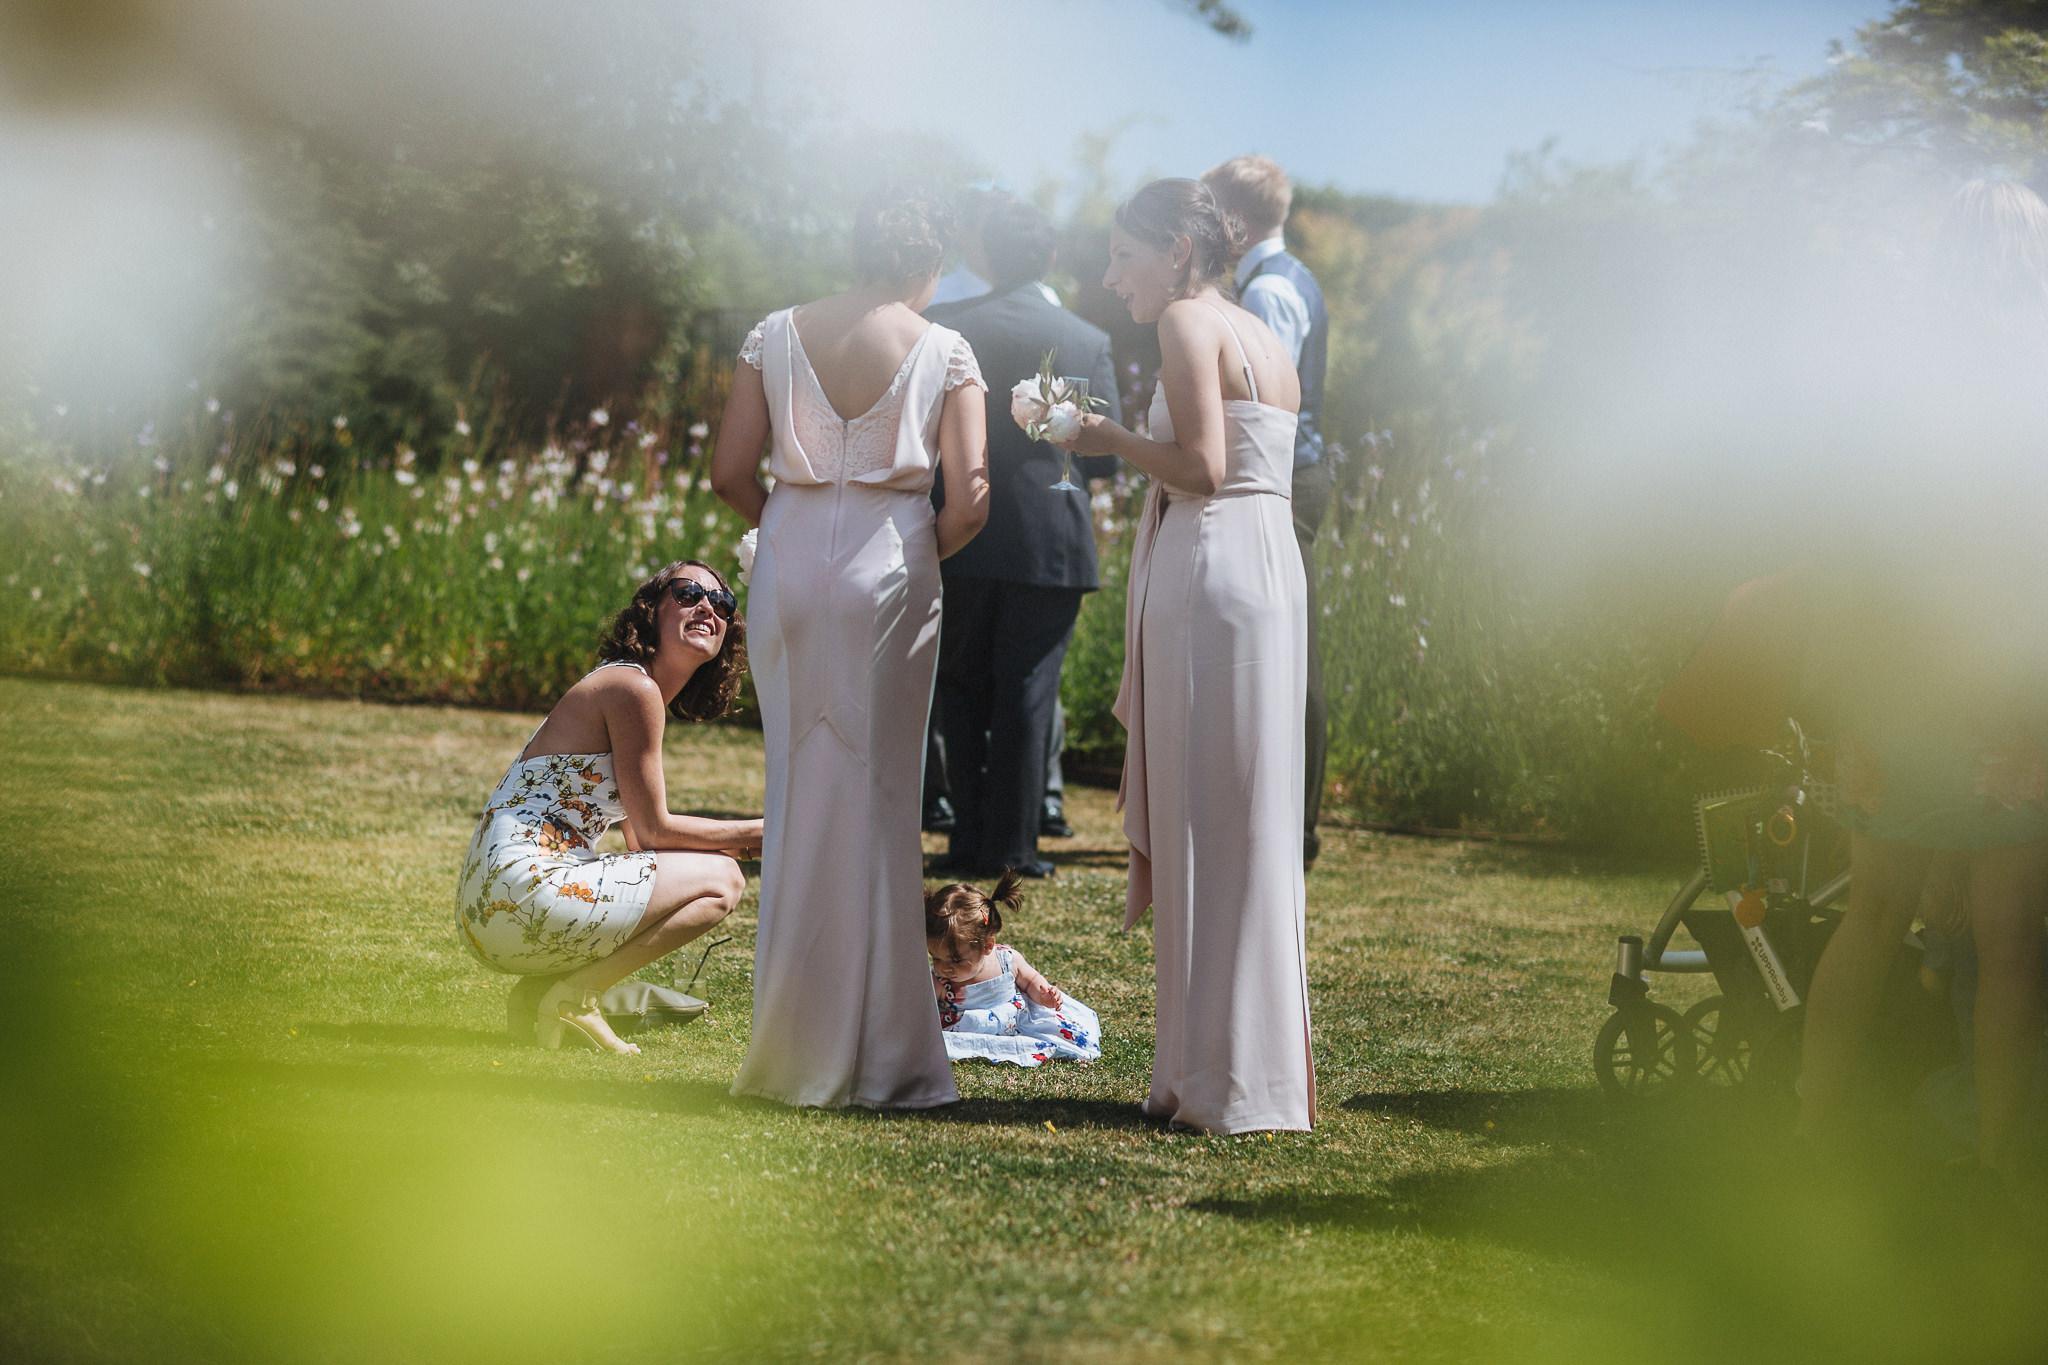 paul-marbrook-Gaynes-Park Wedding-Photographer-90085